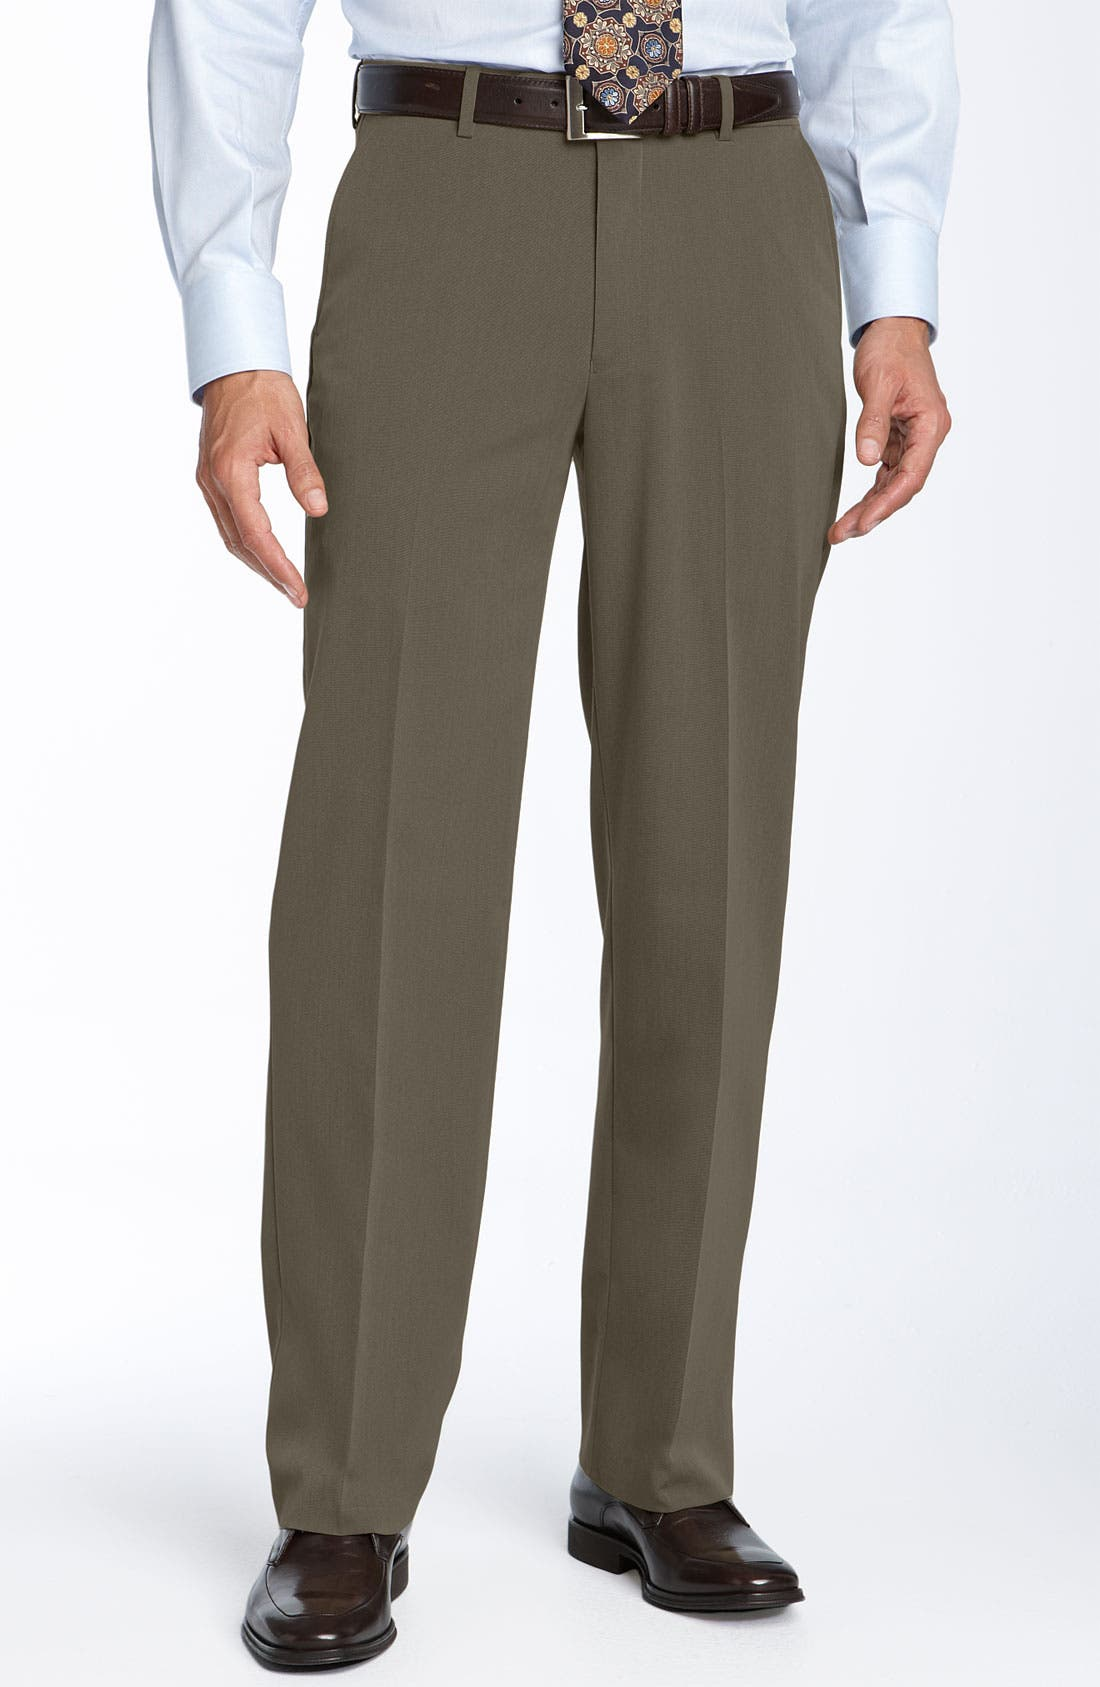 Main Image - Ballin Comfort EZE Flat Front Trousers